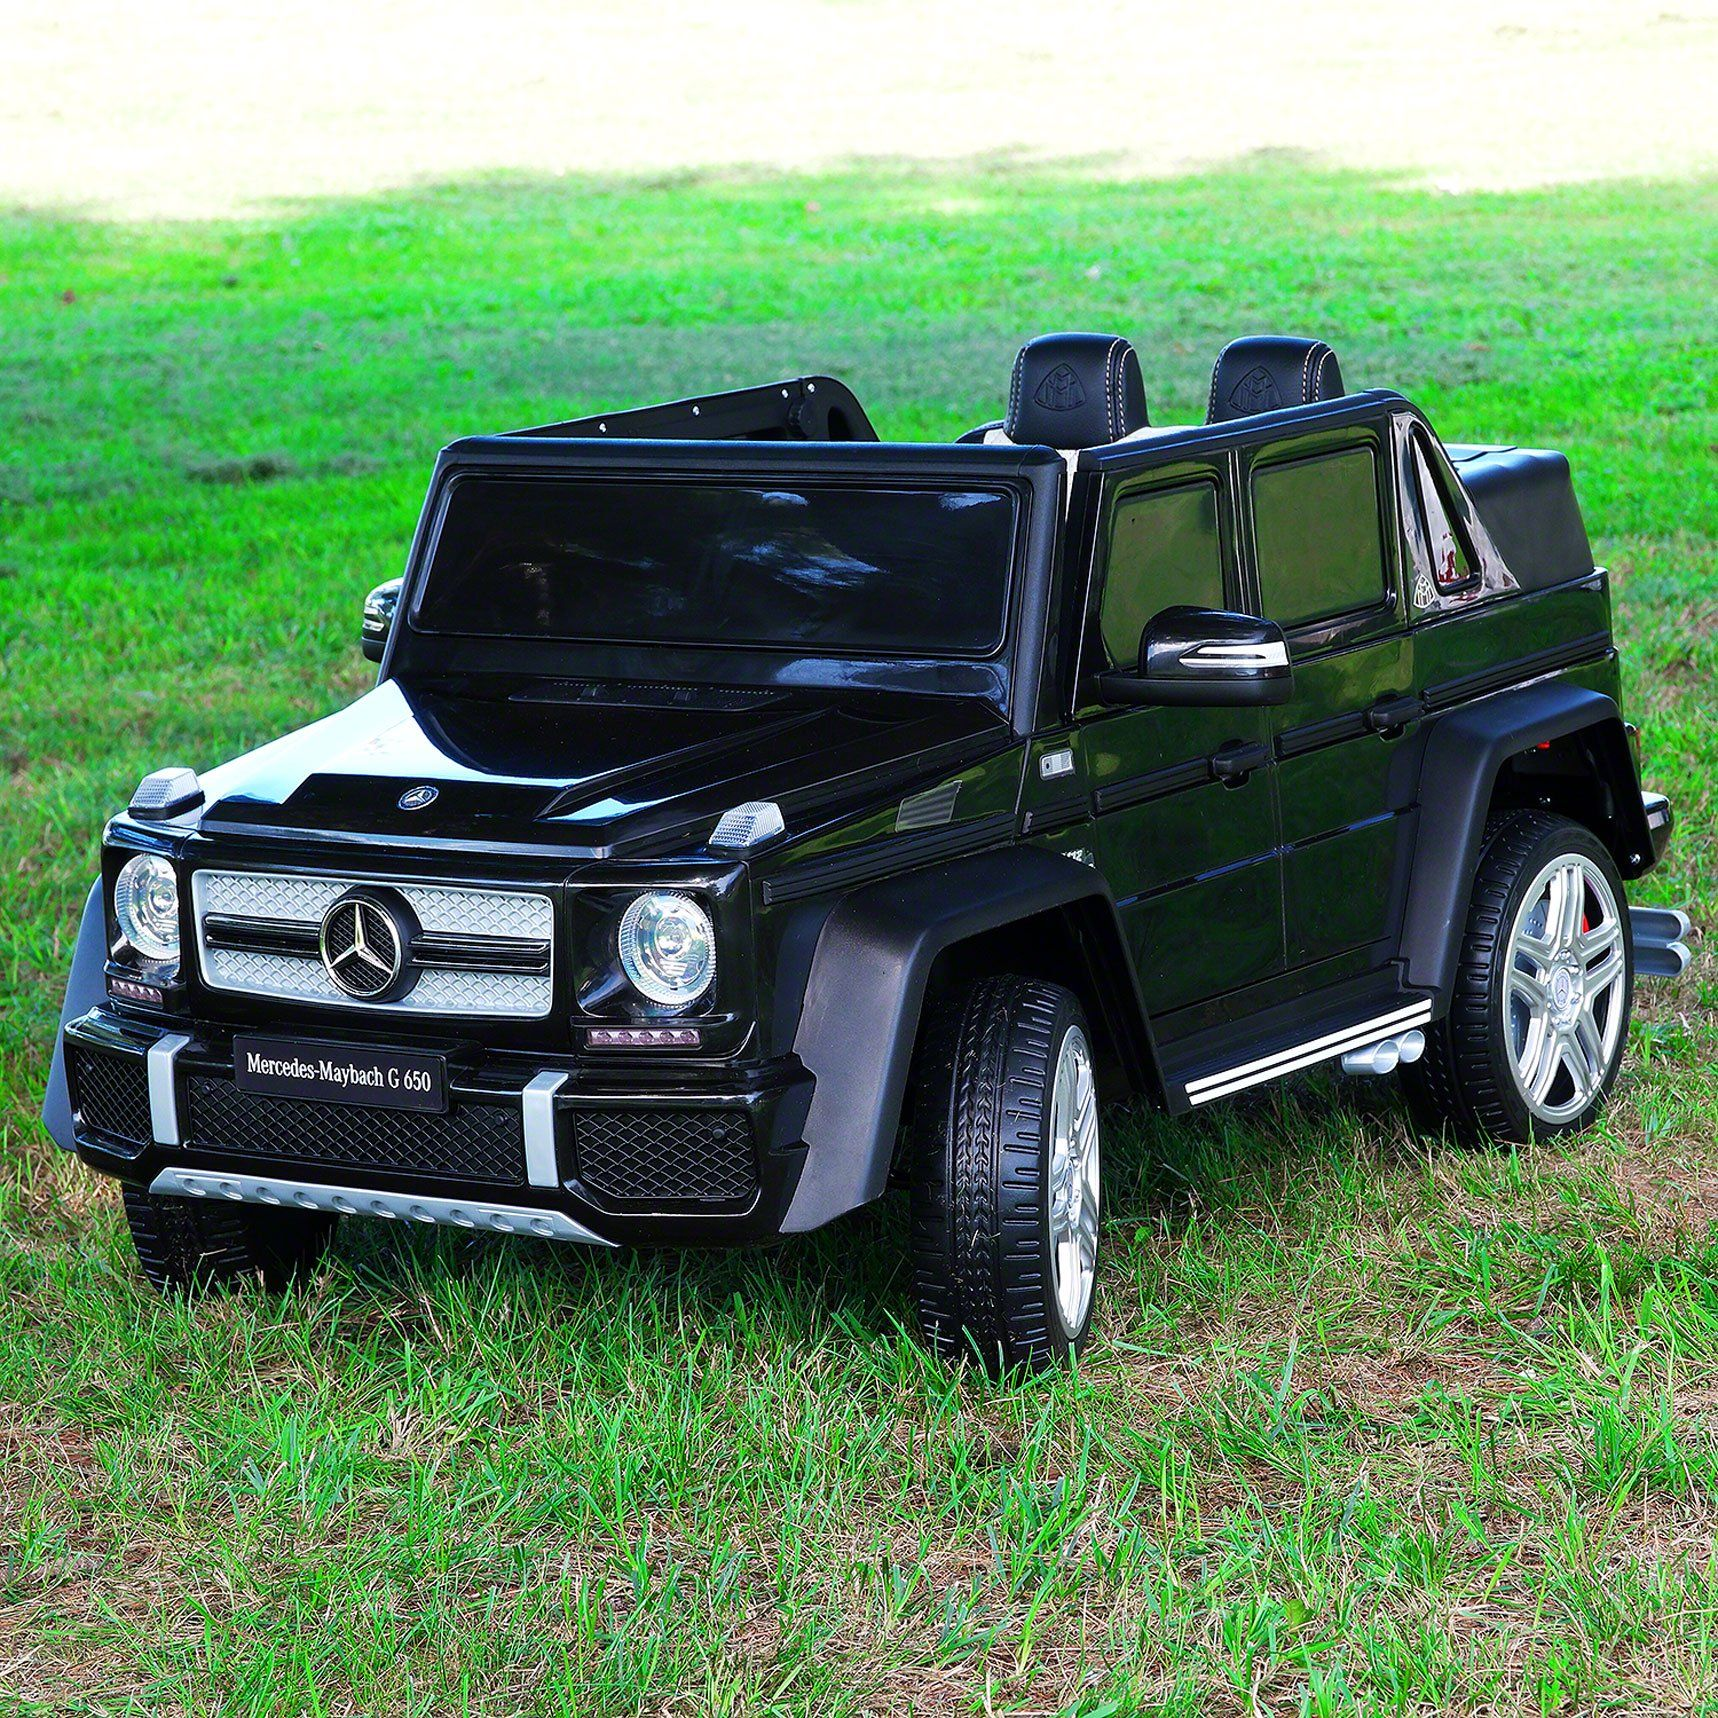 Mercedes Maybach G650 12V Kids RideOn Car with Parental